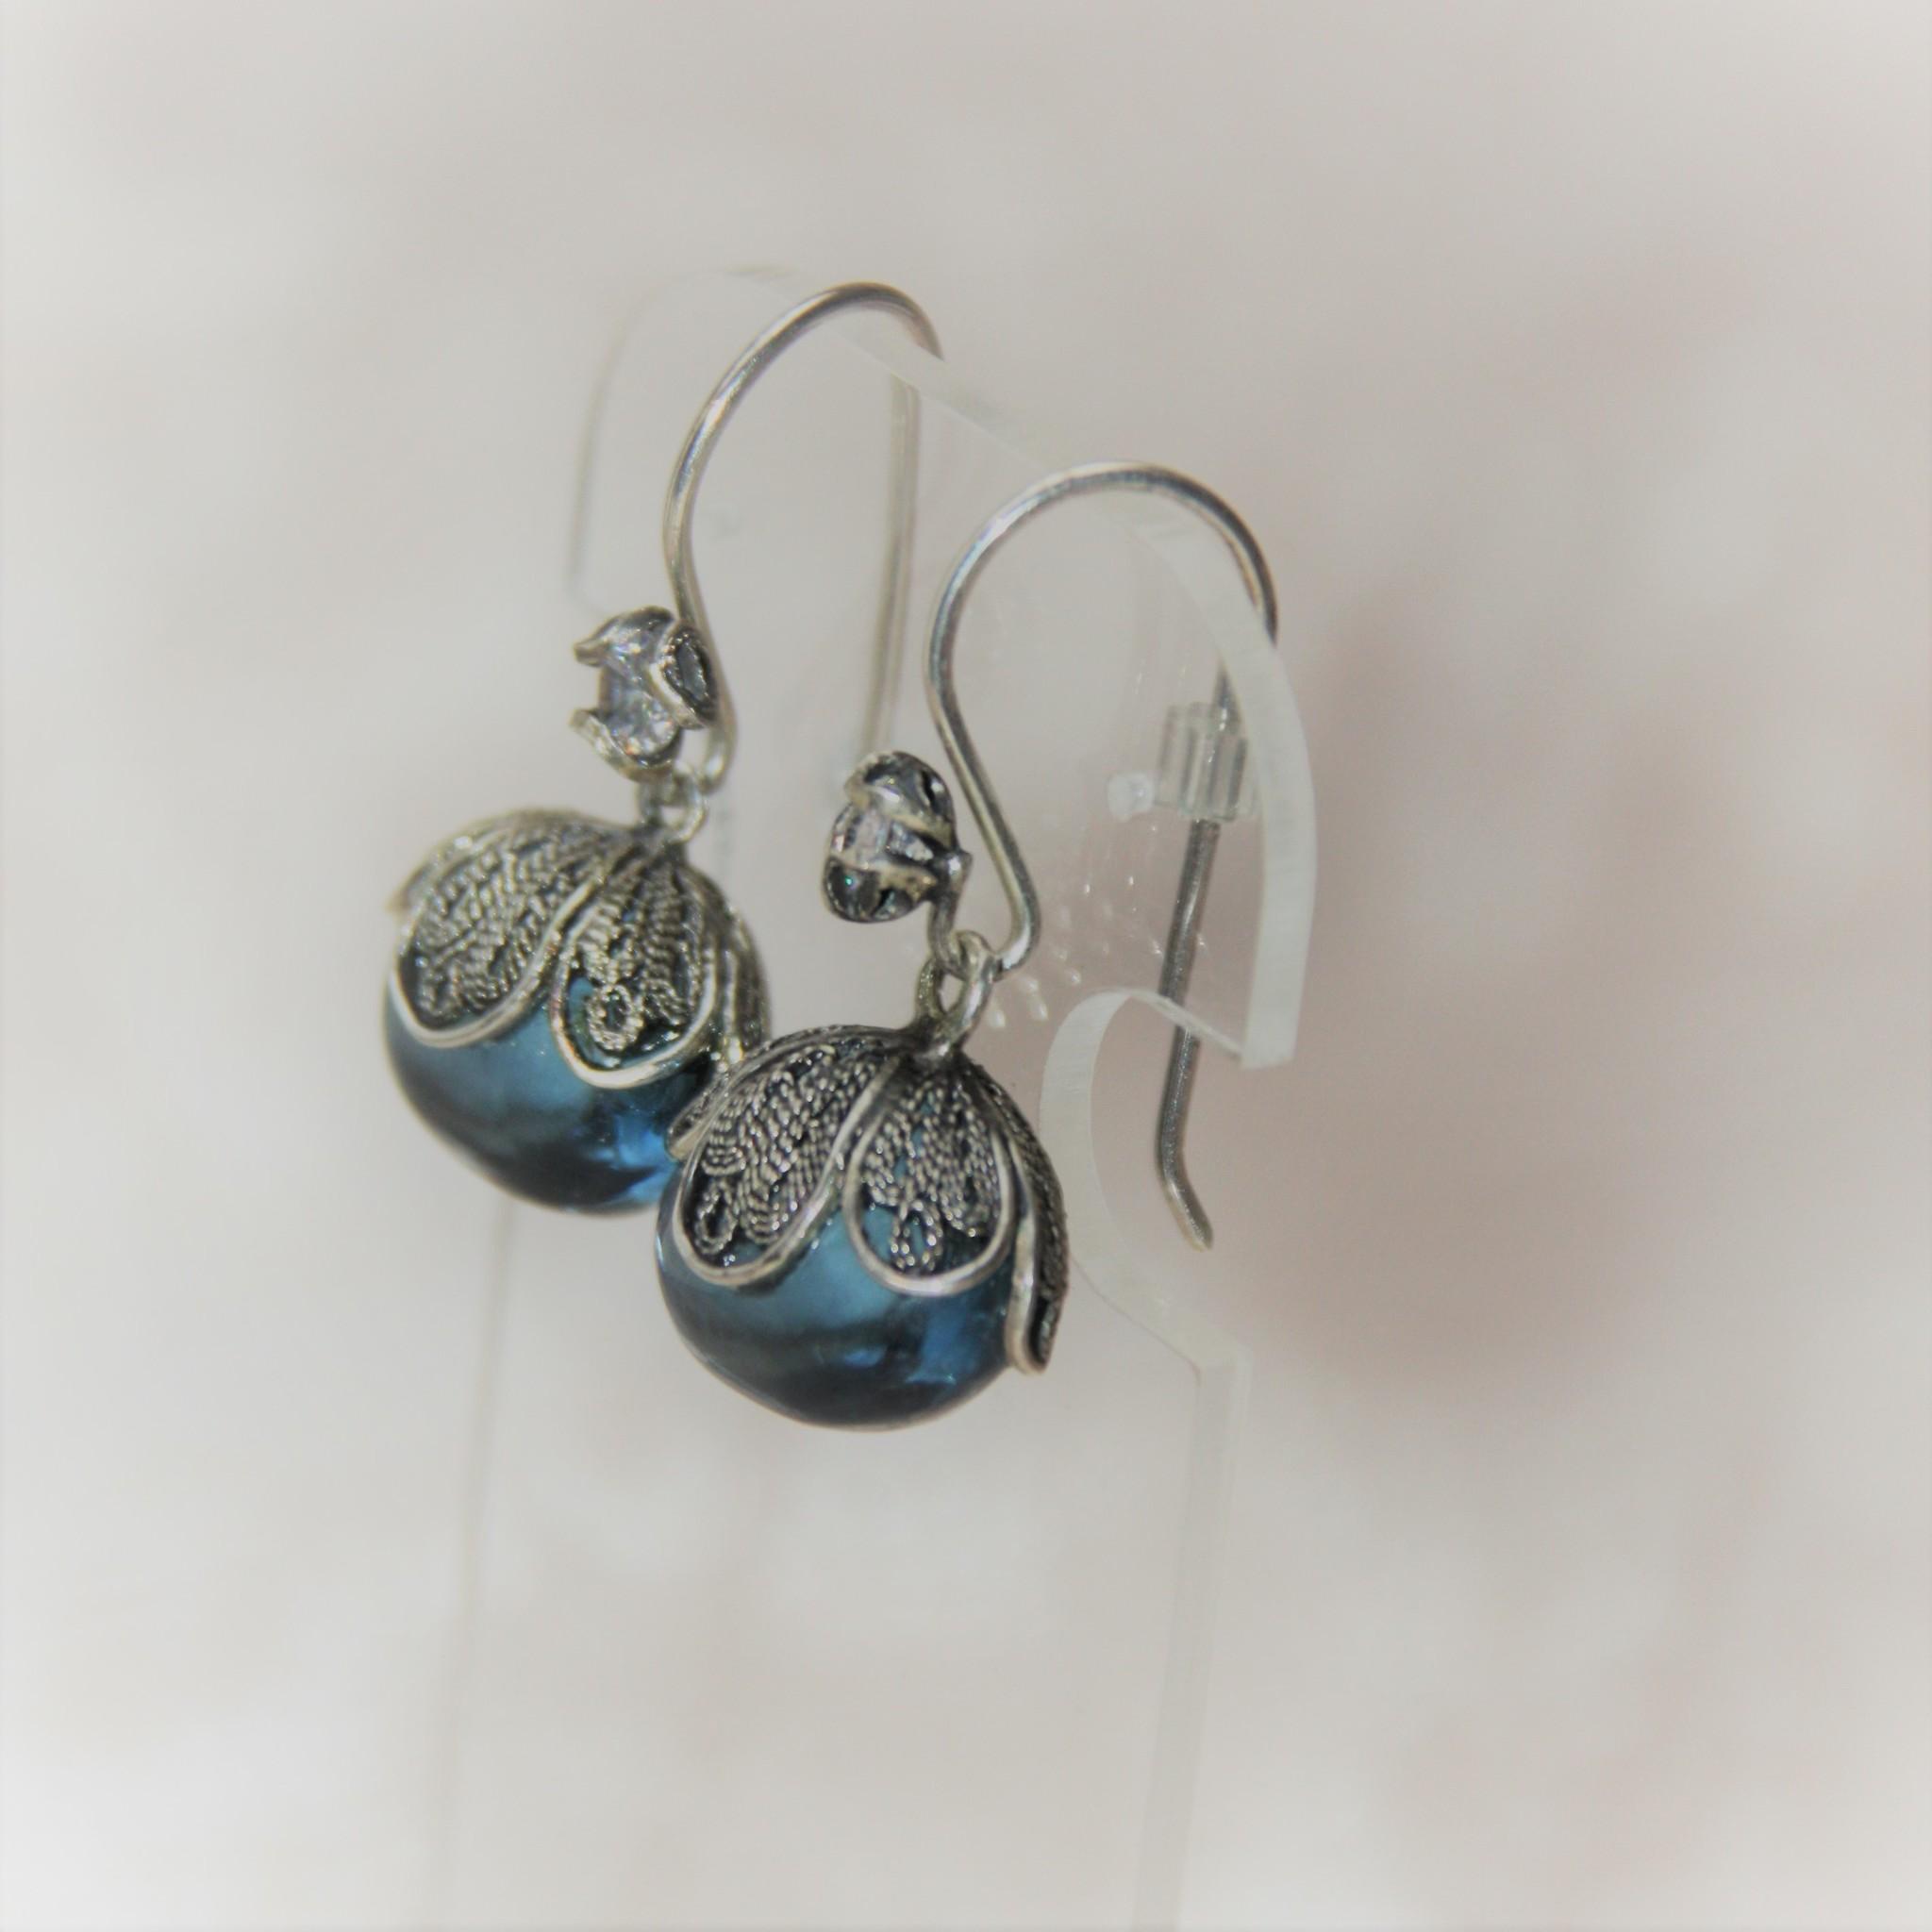 Yvone Christa Blue Aqua Lemoria earrings